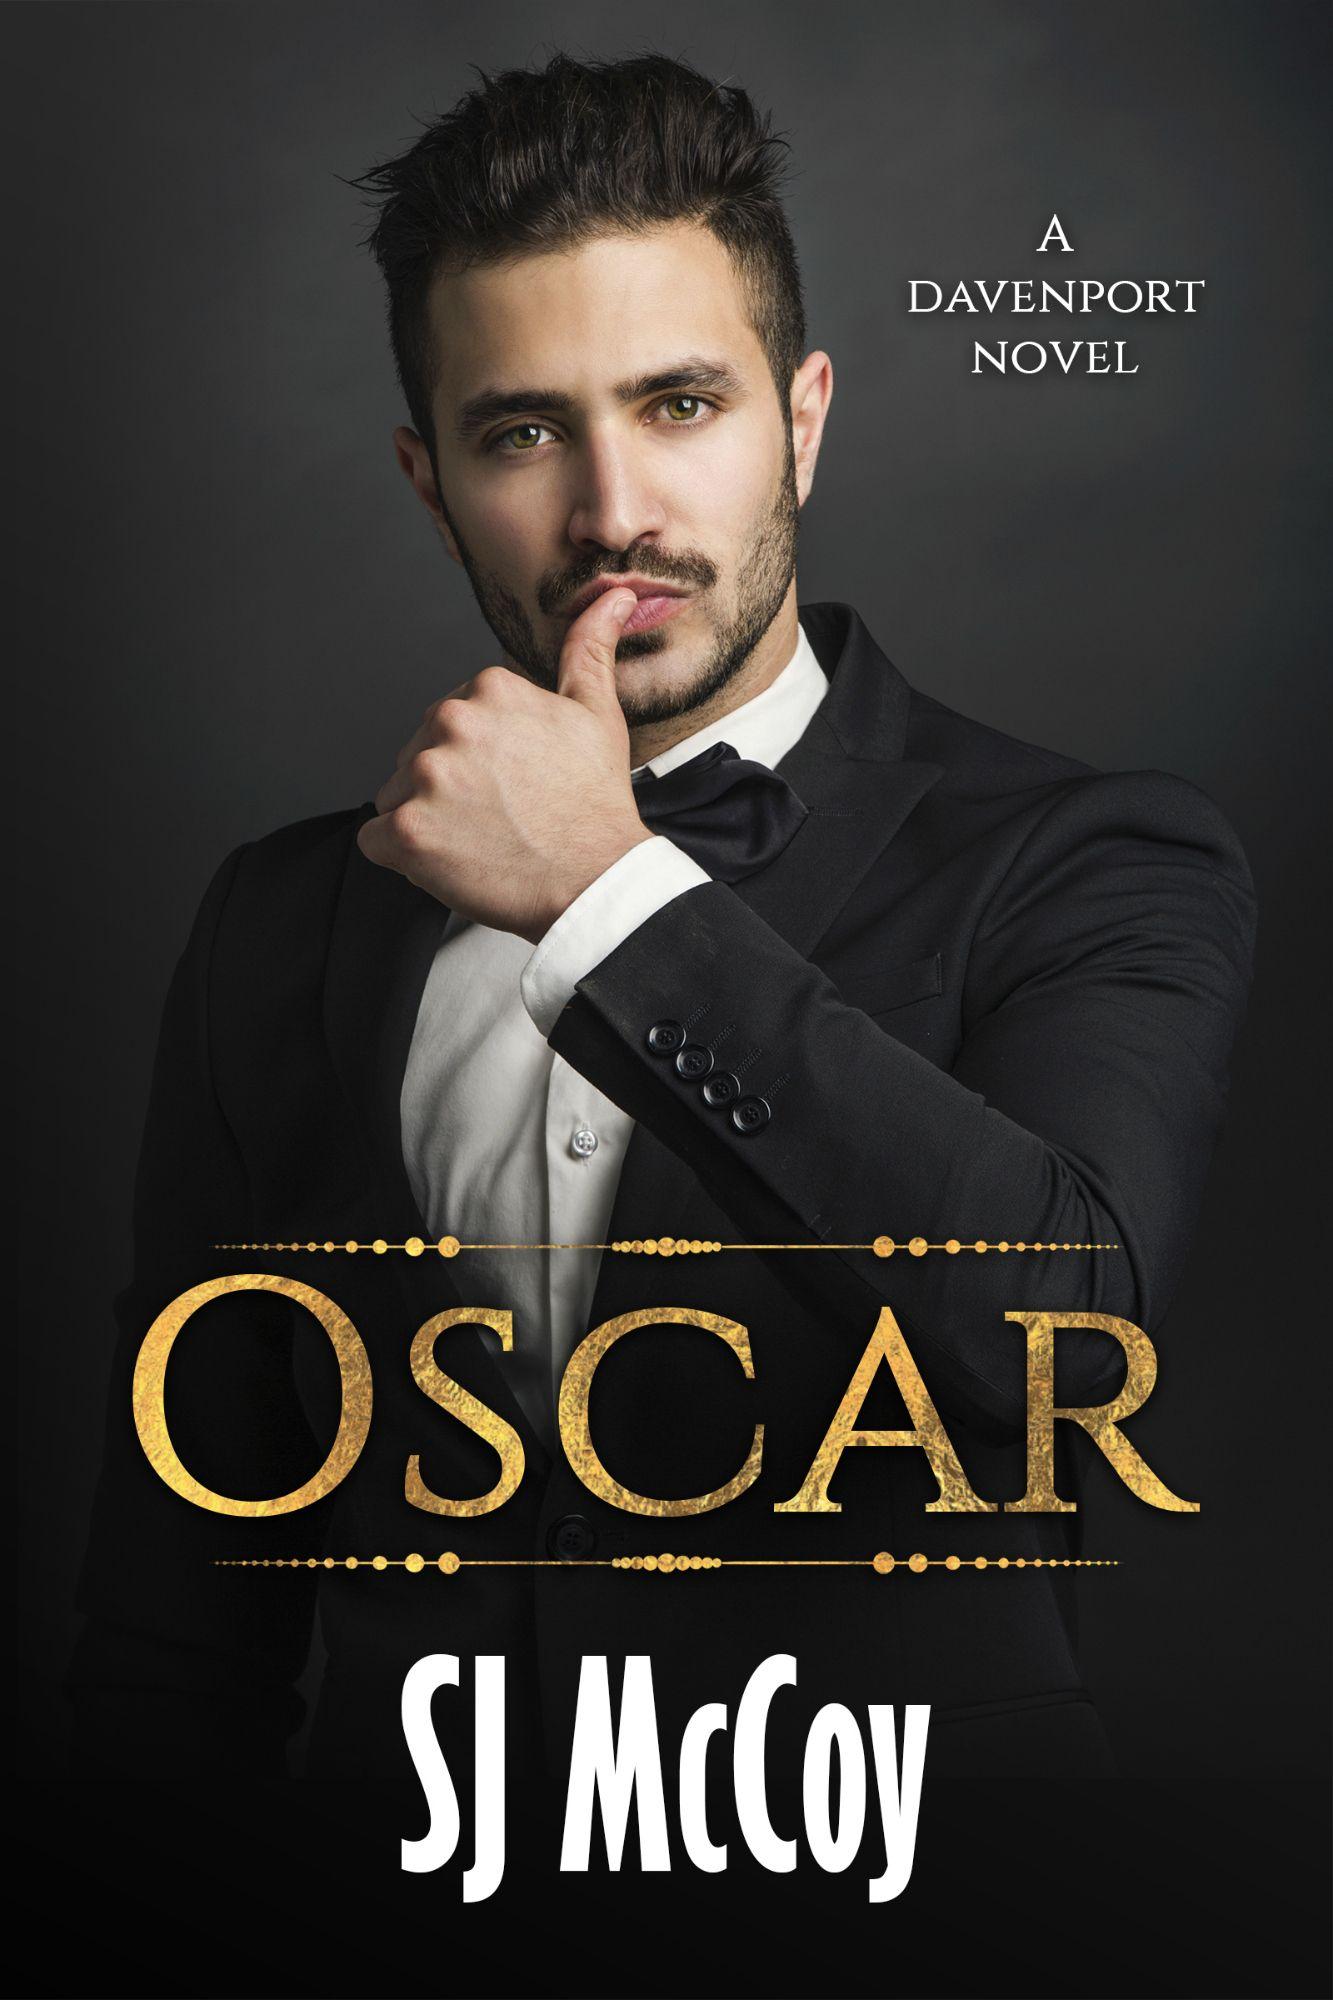 OSCAR by SJ McCoy Book boyfriends, Romance books, Novels